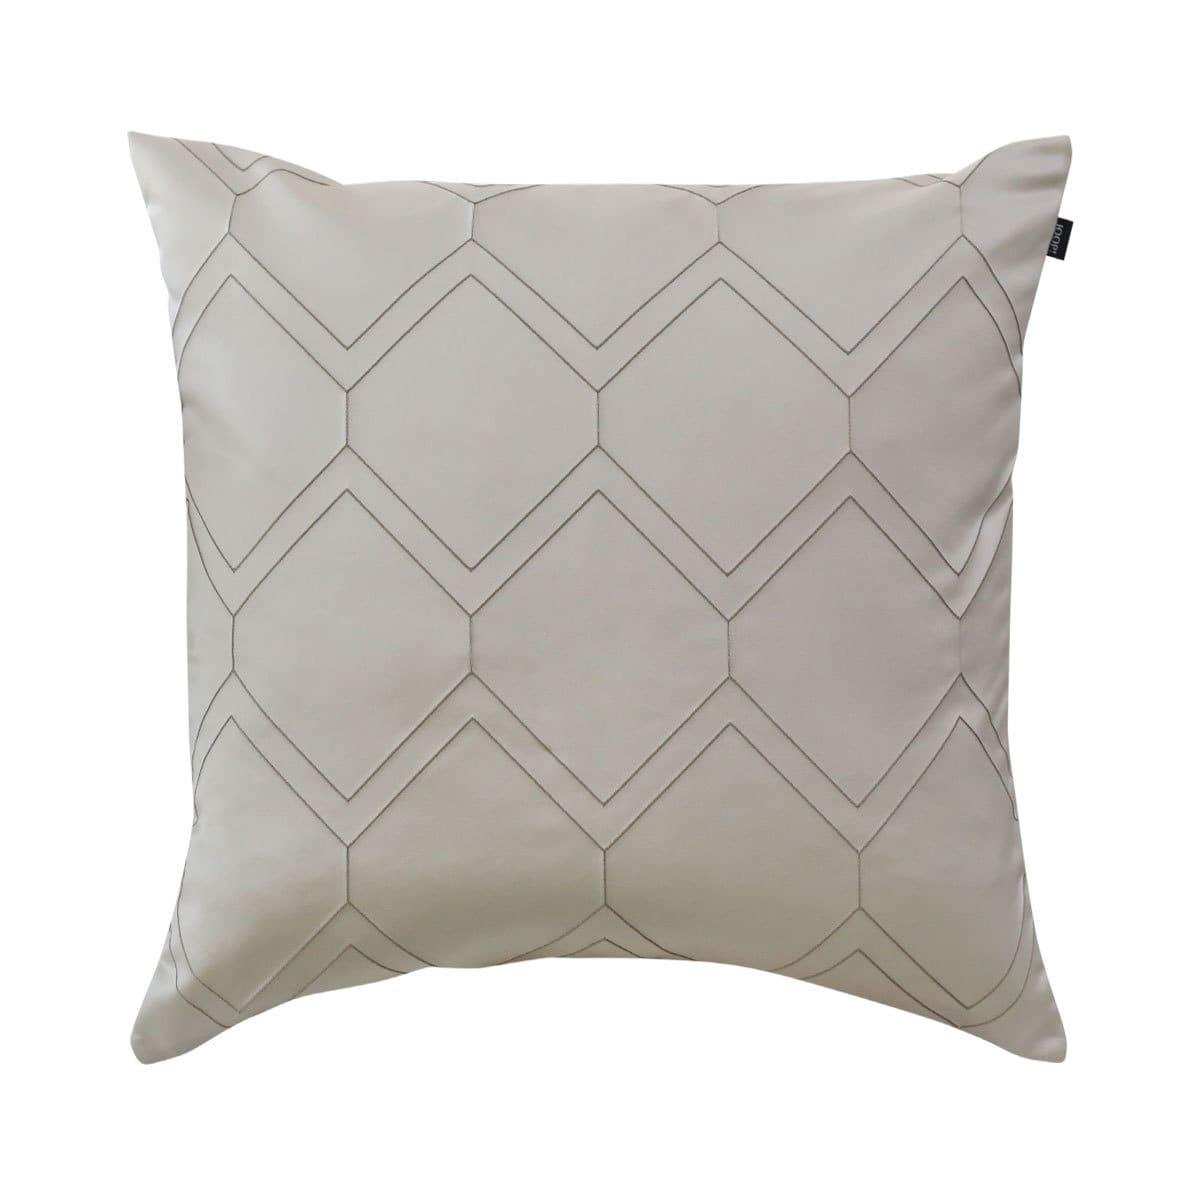 joop kissenh lle elegana beige g nstig online kaufen bei bettwaren shop. Black Bedroom Furniture Sets. Home Design Ideas